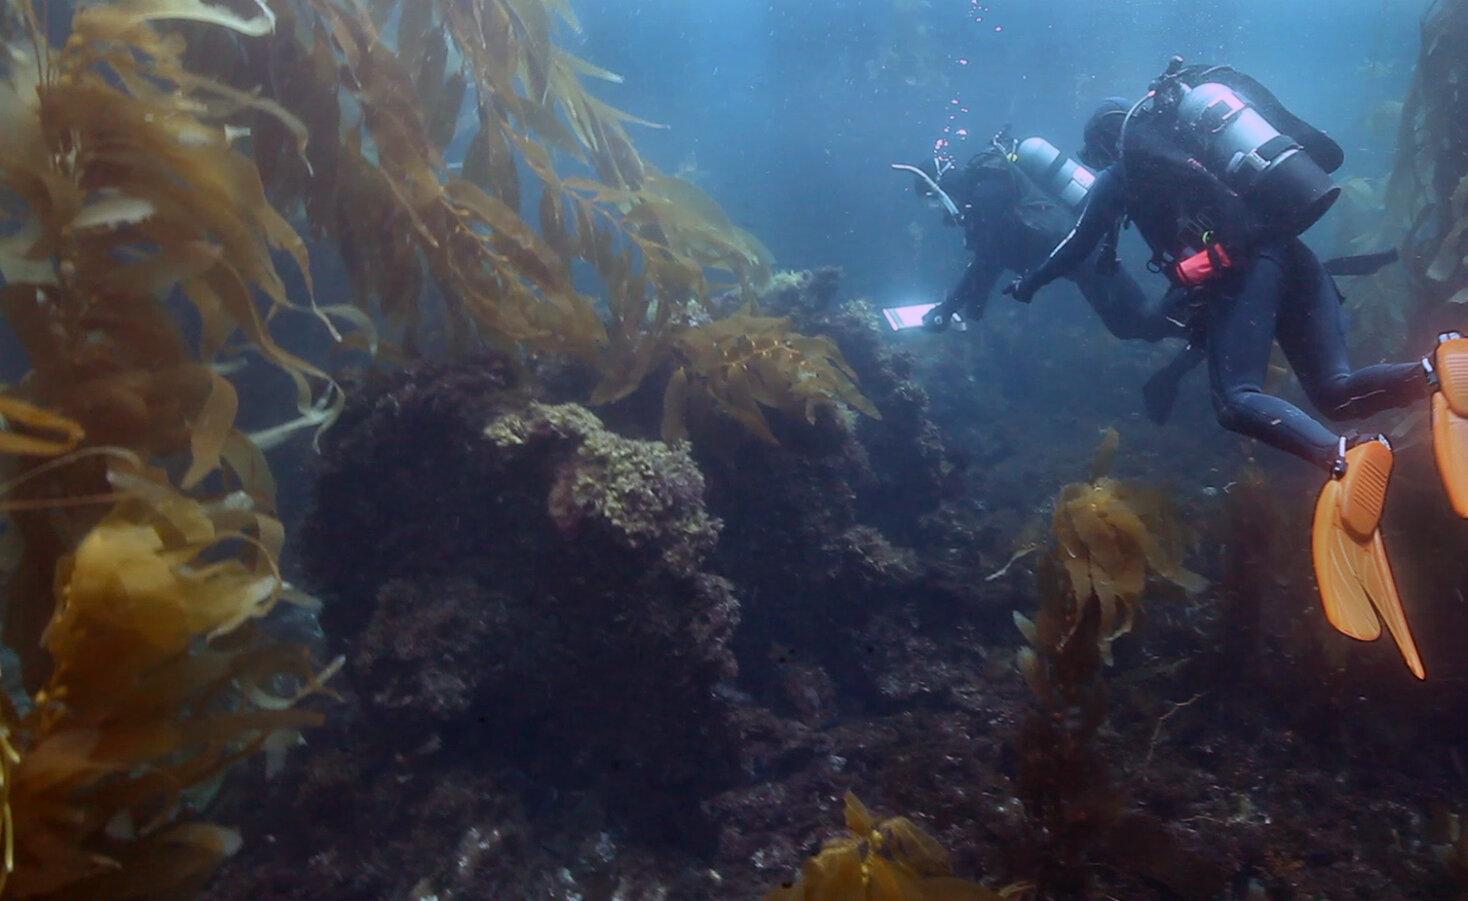 Underwater footage of the Winfield Scott shipwreck